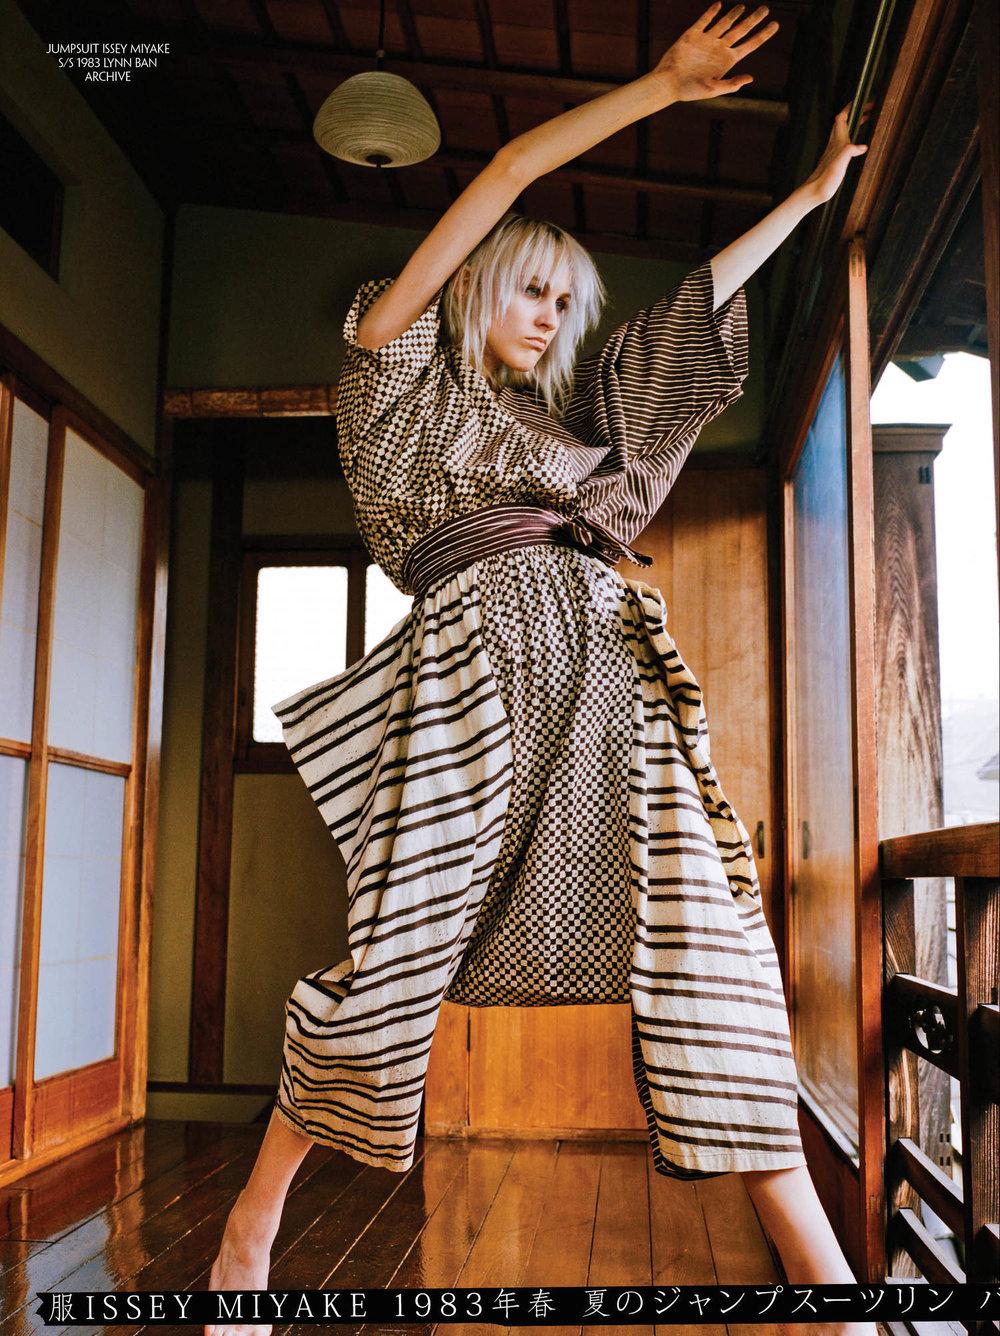 CR Fashion Book x Jiro Konami